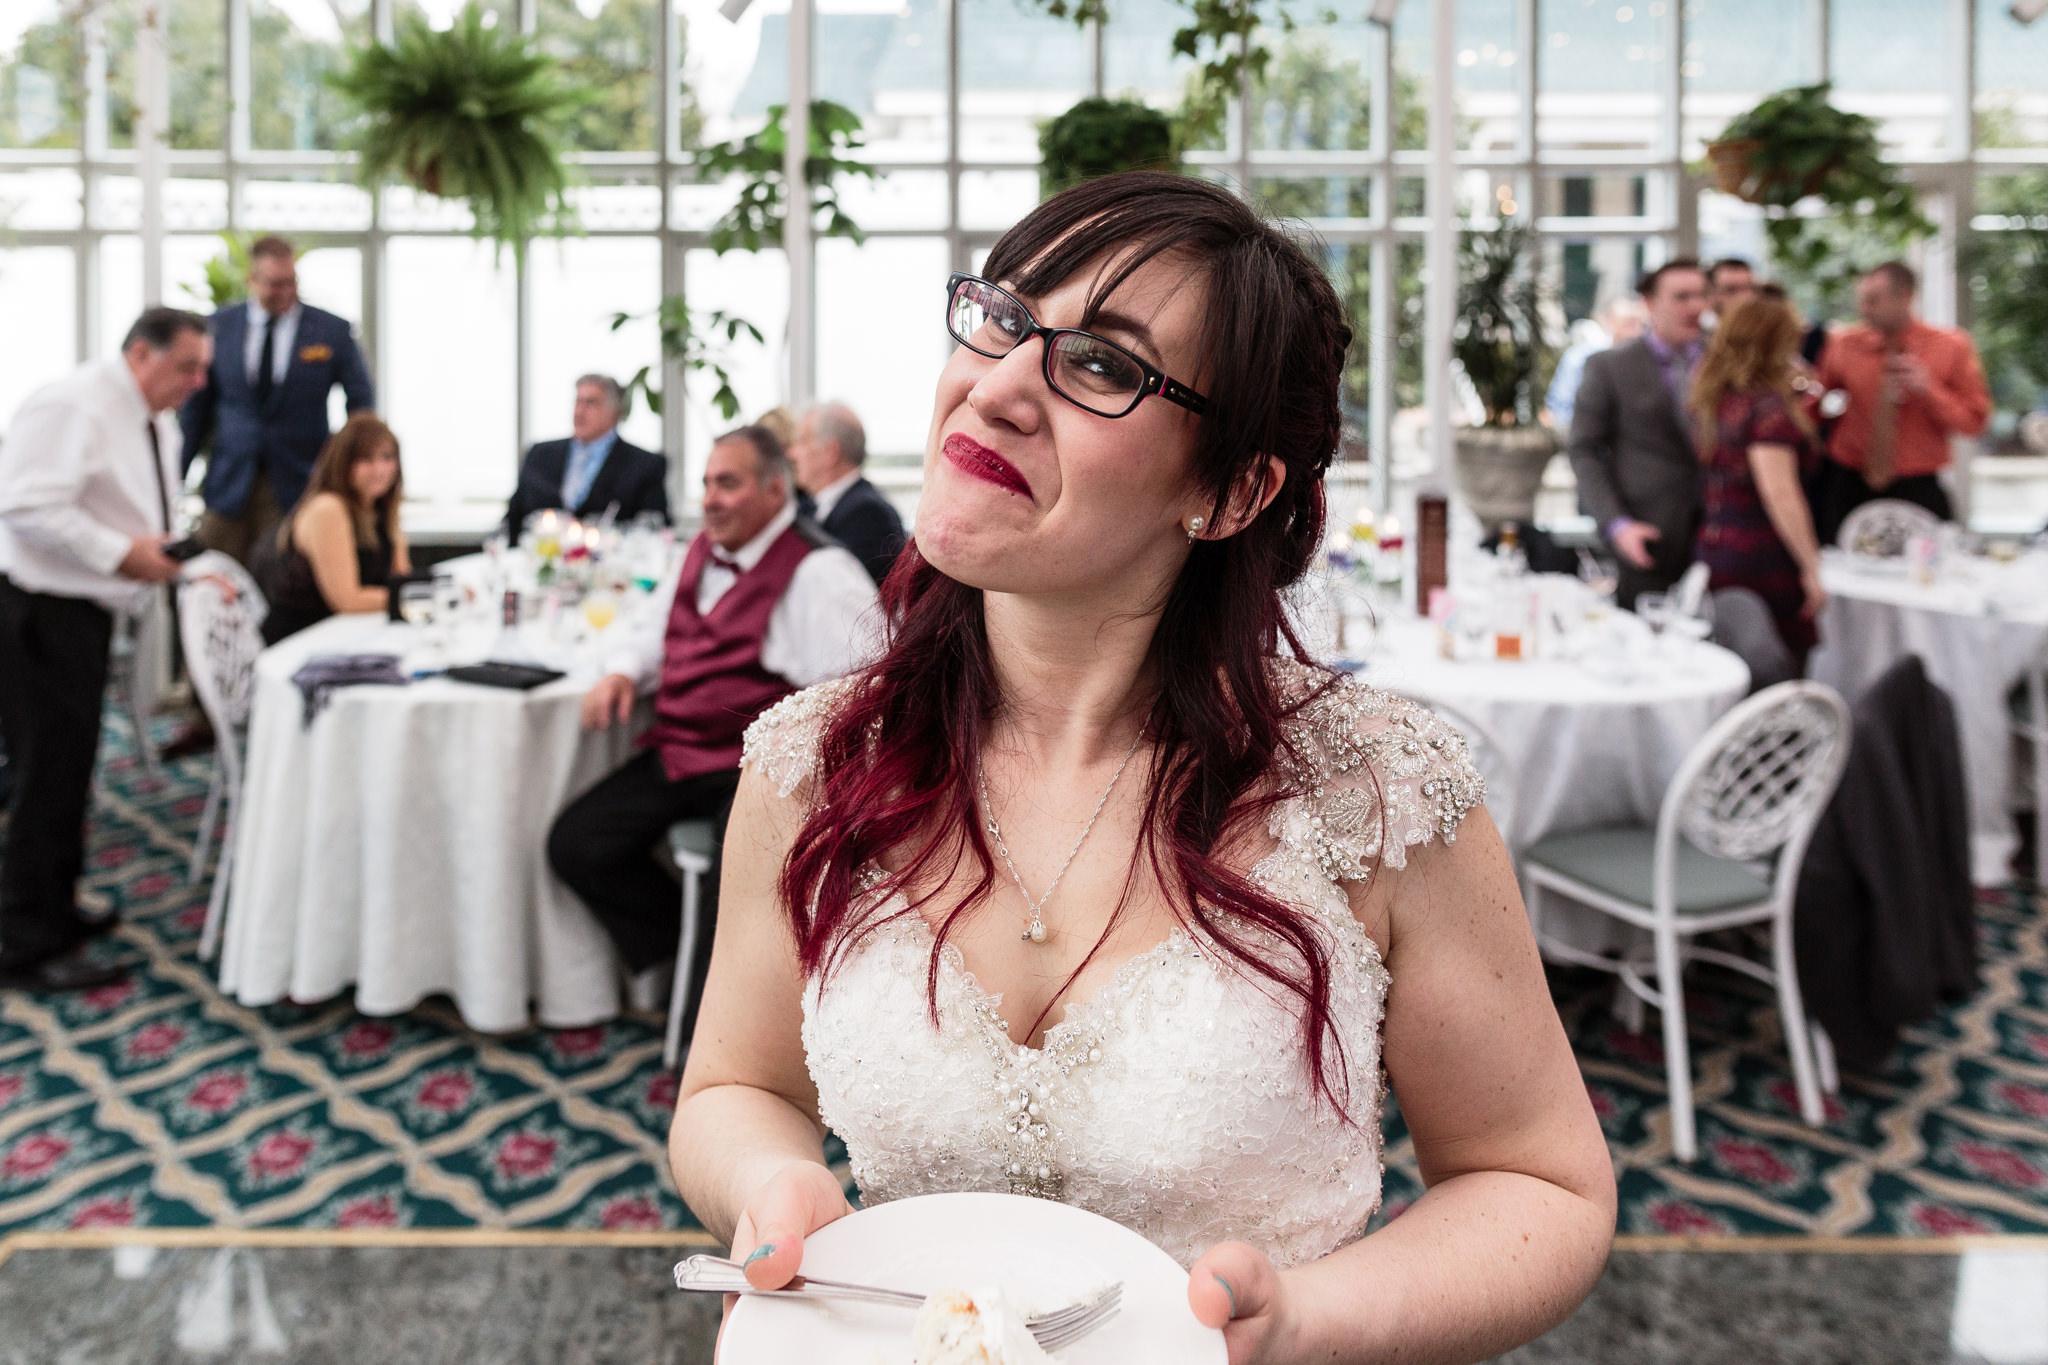 Hanchar_Madison_Hotel_NJ_Wedding_2C0A8341.jpg